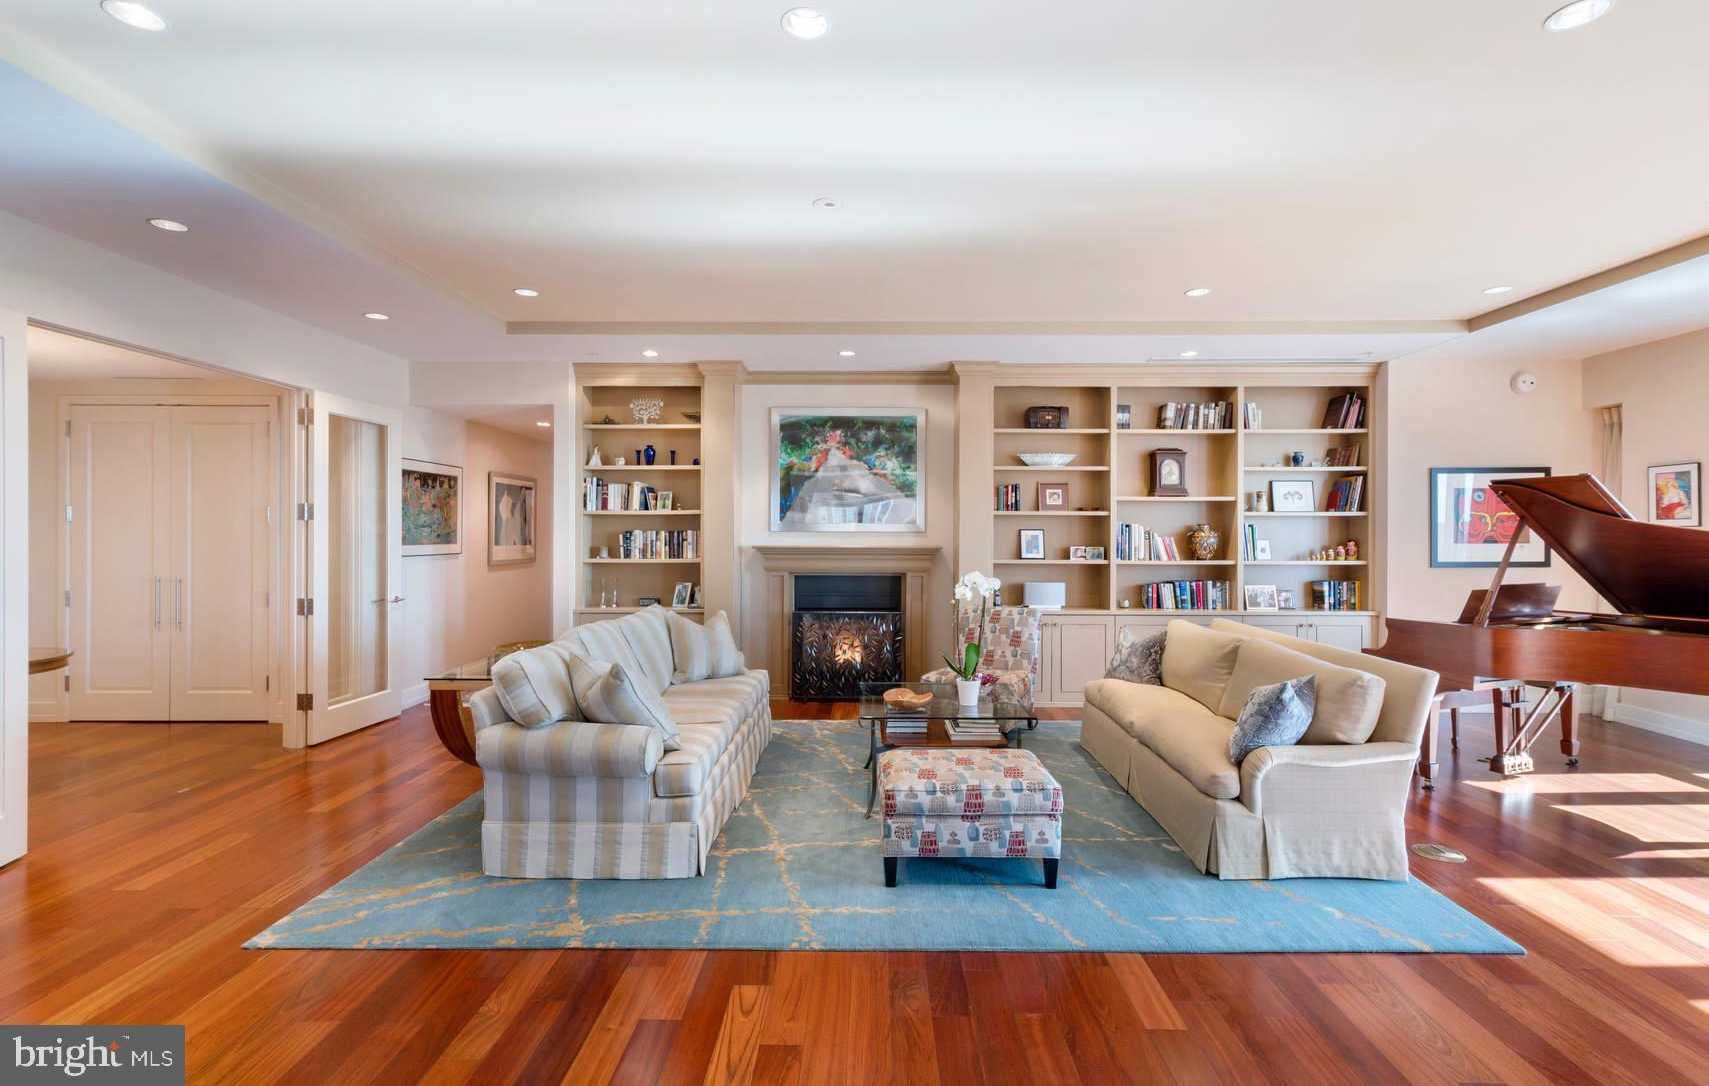 $4,495,000 - 3Br/3Ba -  for Sale in Rittenhouse Square, Philadelphia